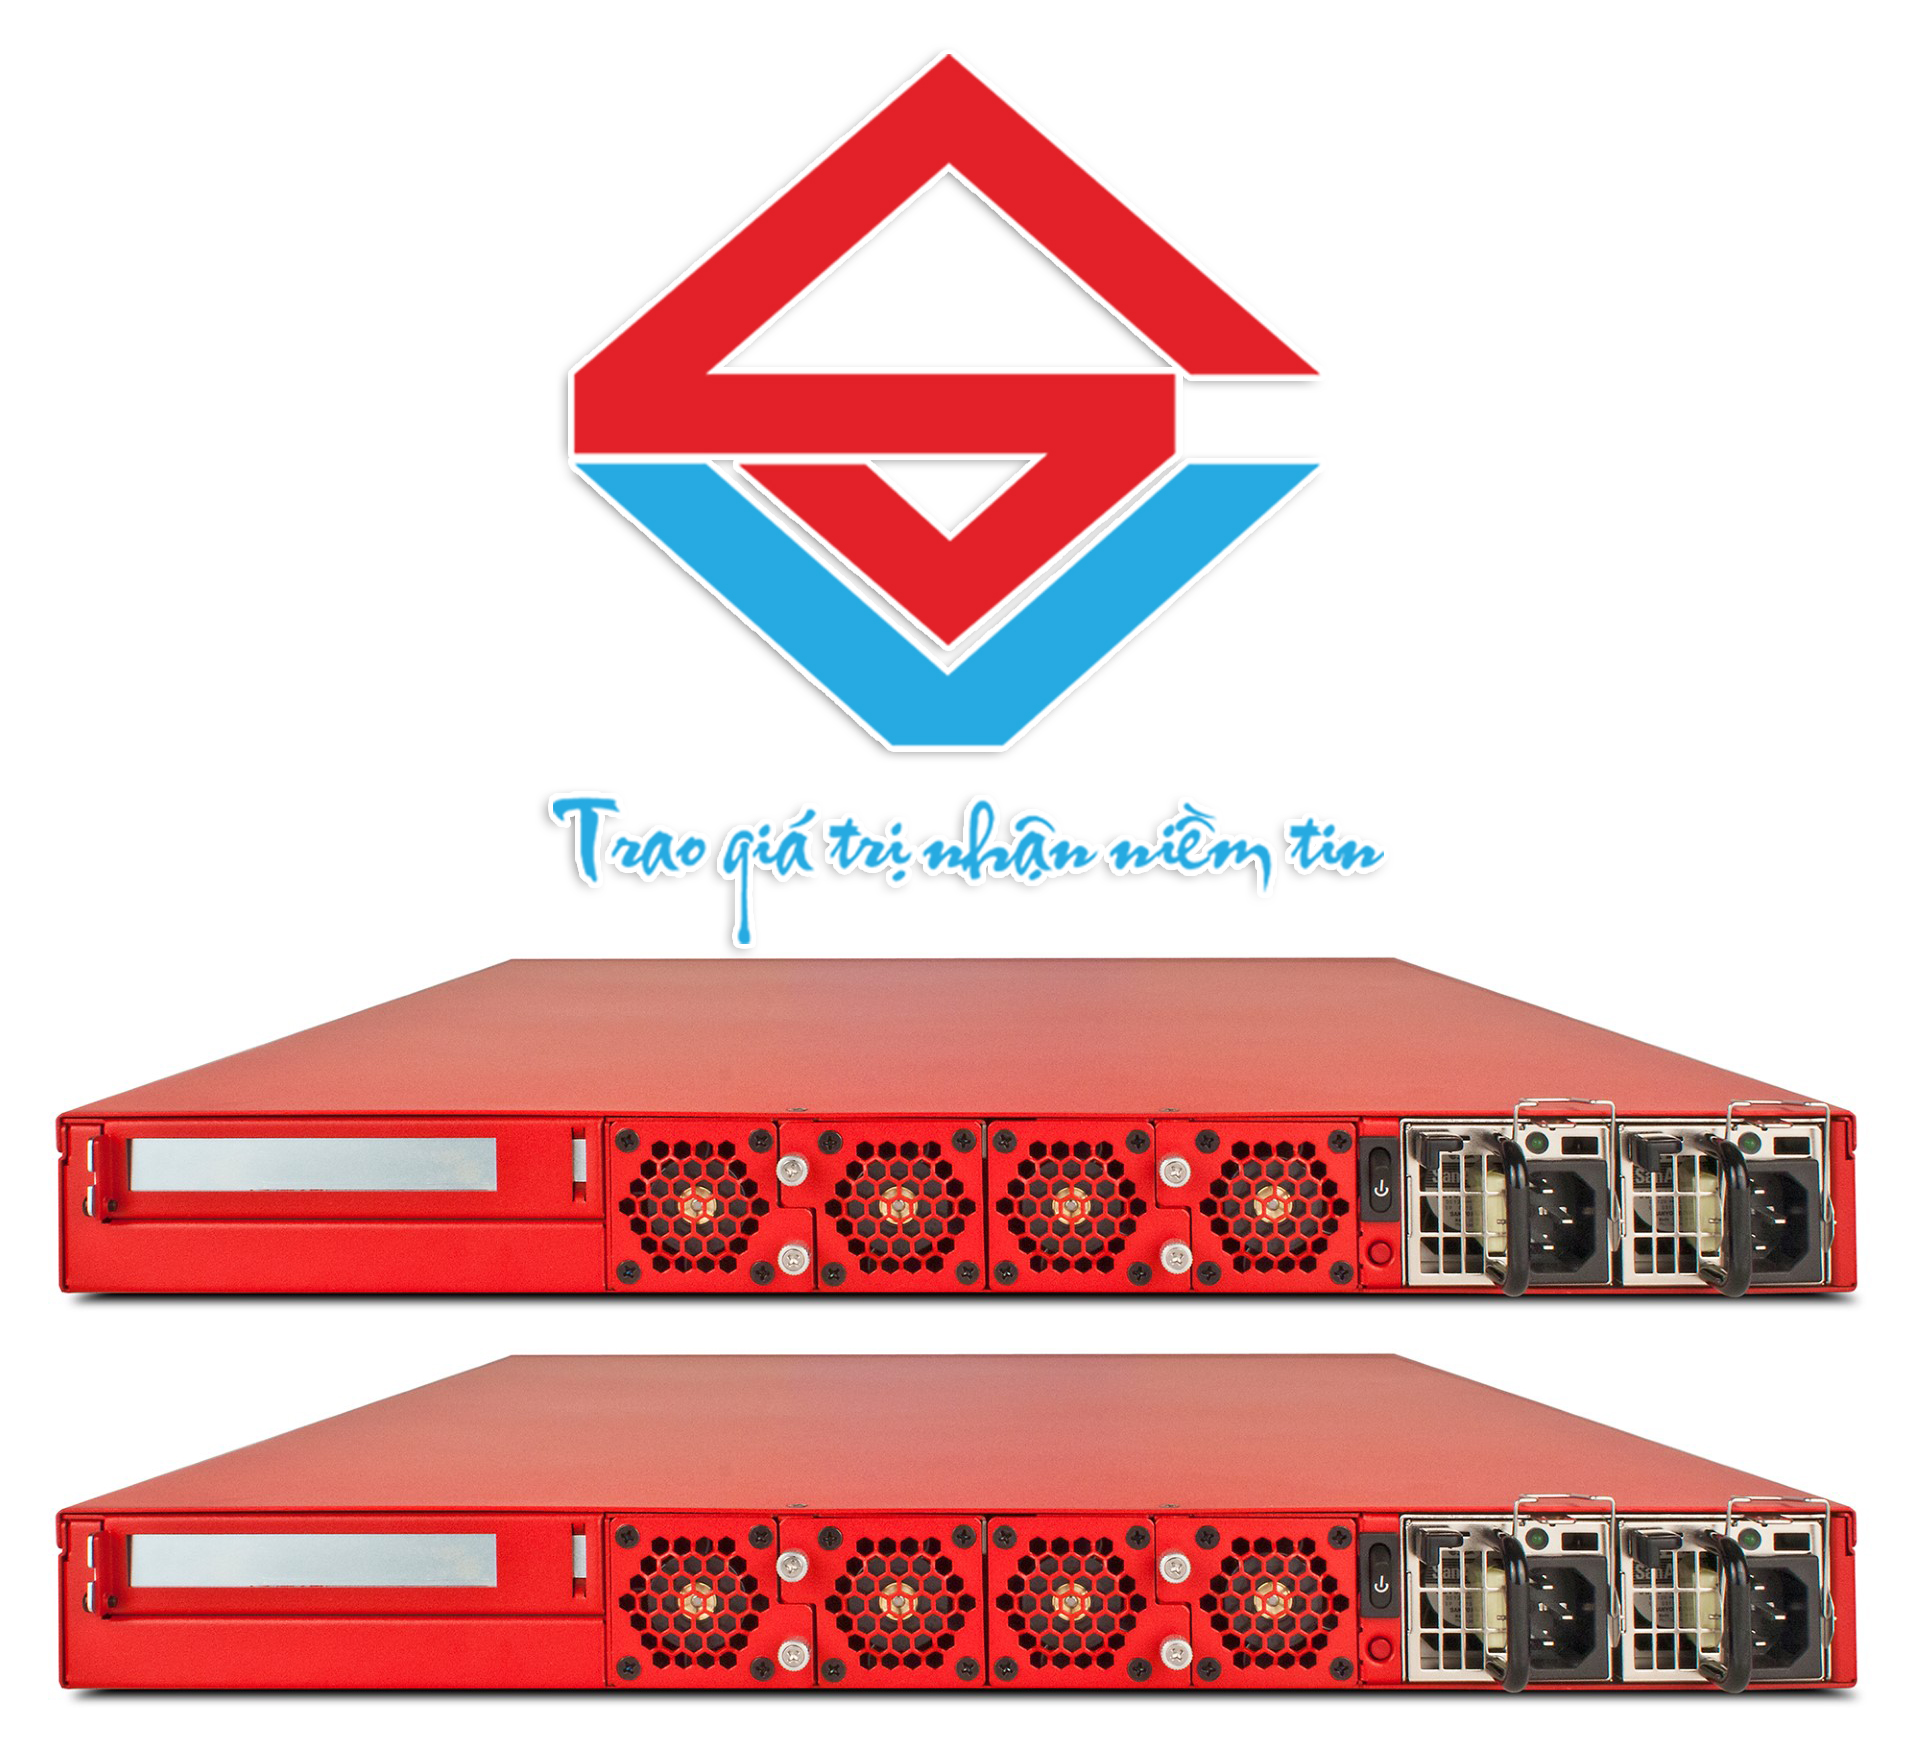 WatchGuard-FireBox-M5600